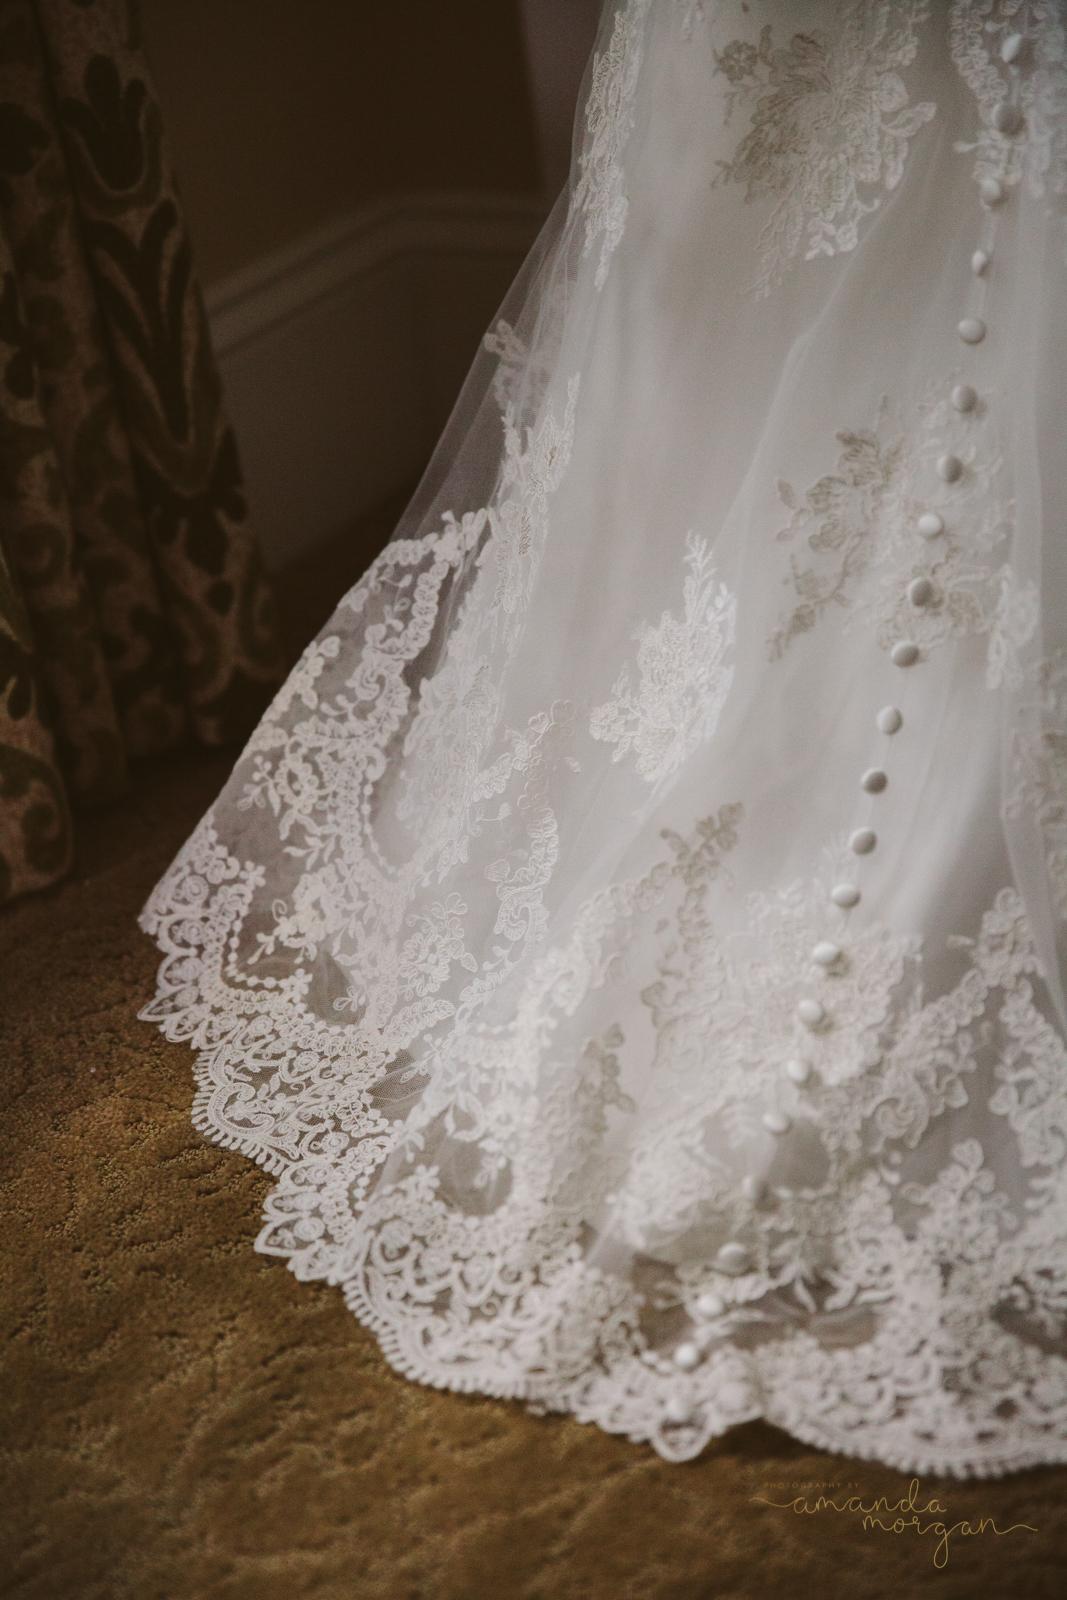 Publick-House-Wedding-Amanda-Morgan-1.jpg